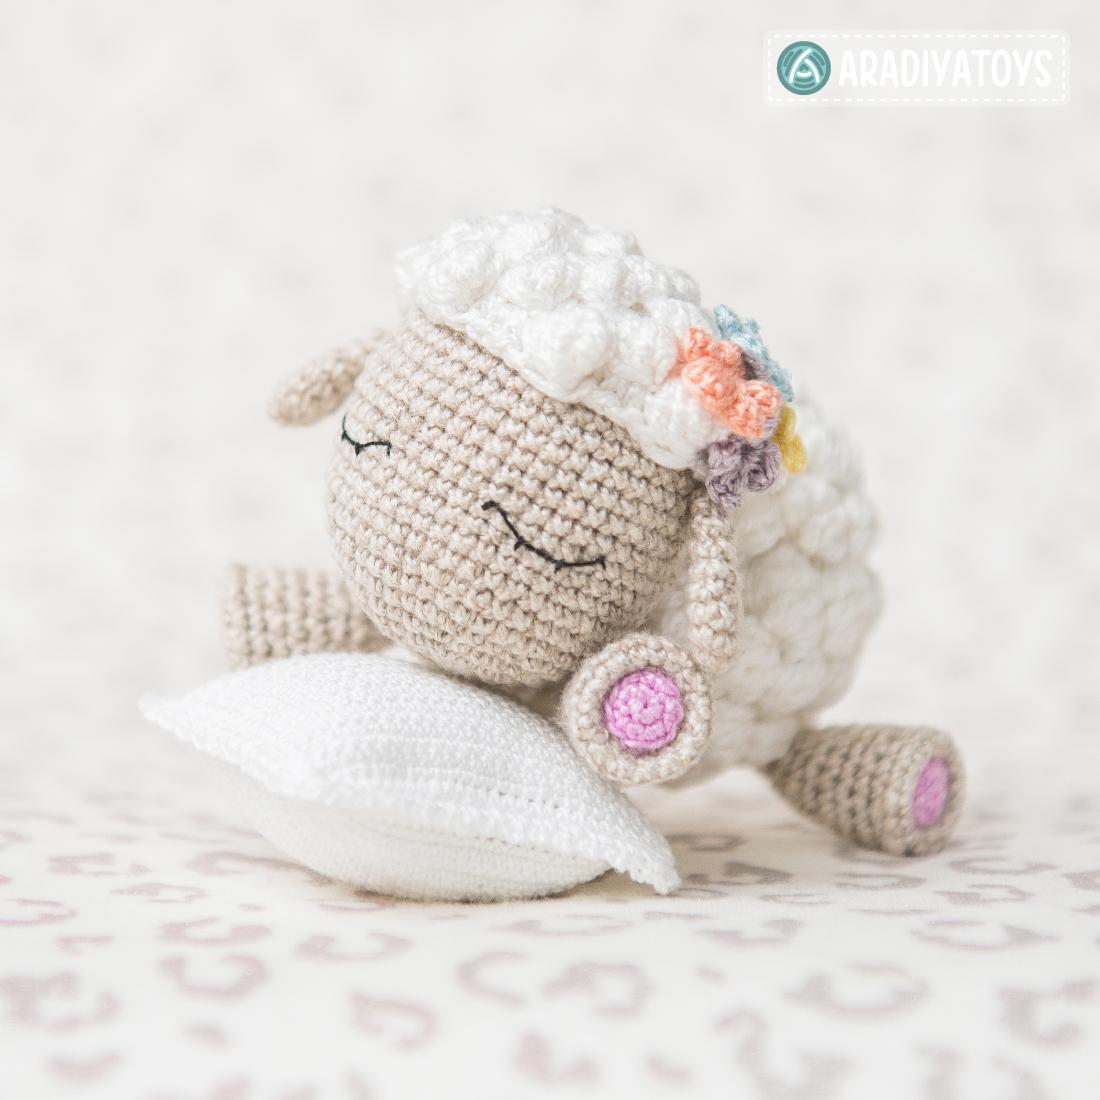 Crochet Pattern of Lamb Shelby by AradiyaToys